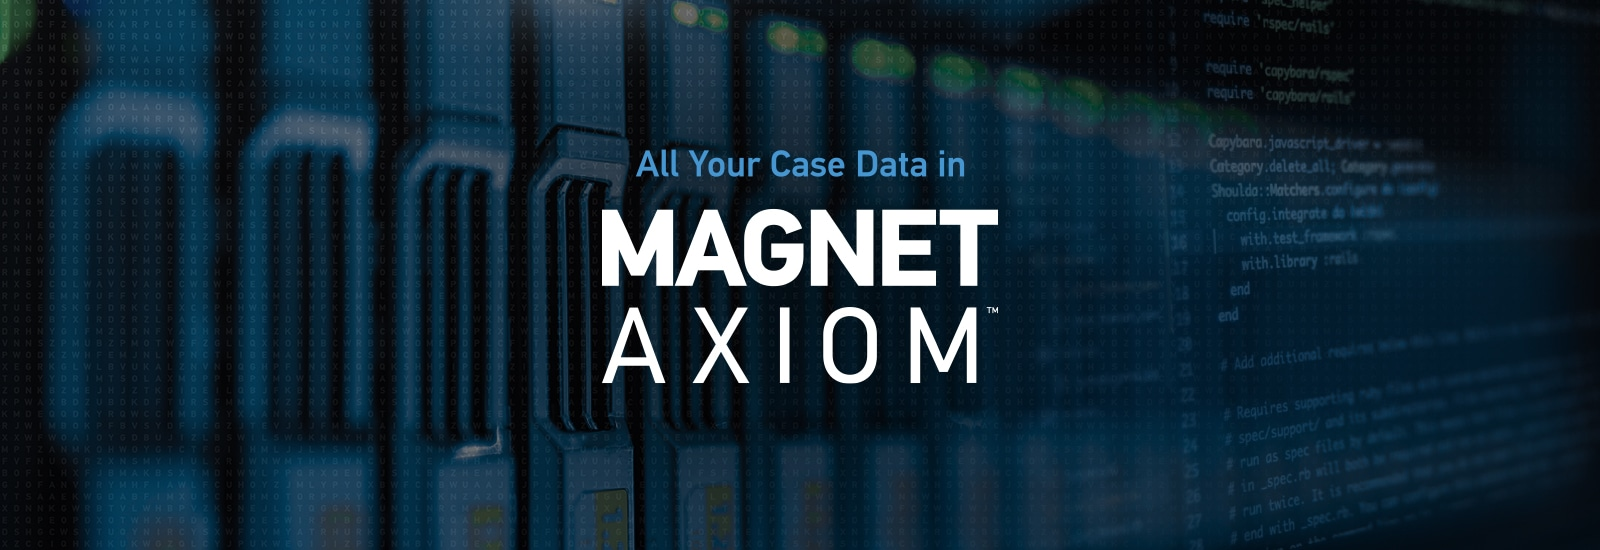 AXIOM All in One - Cloud